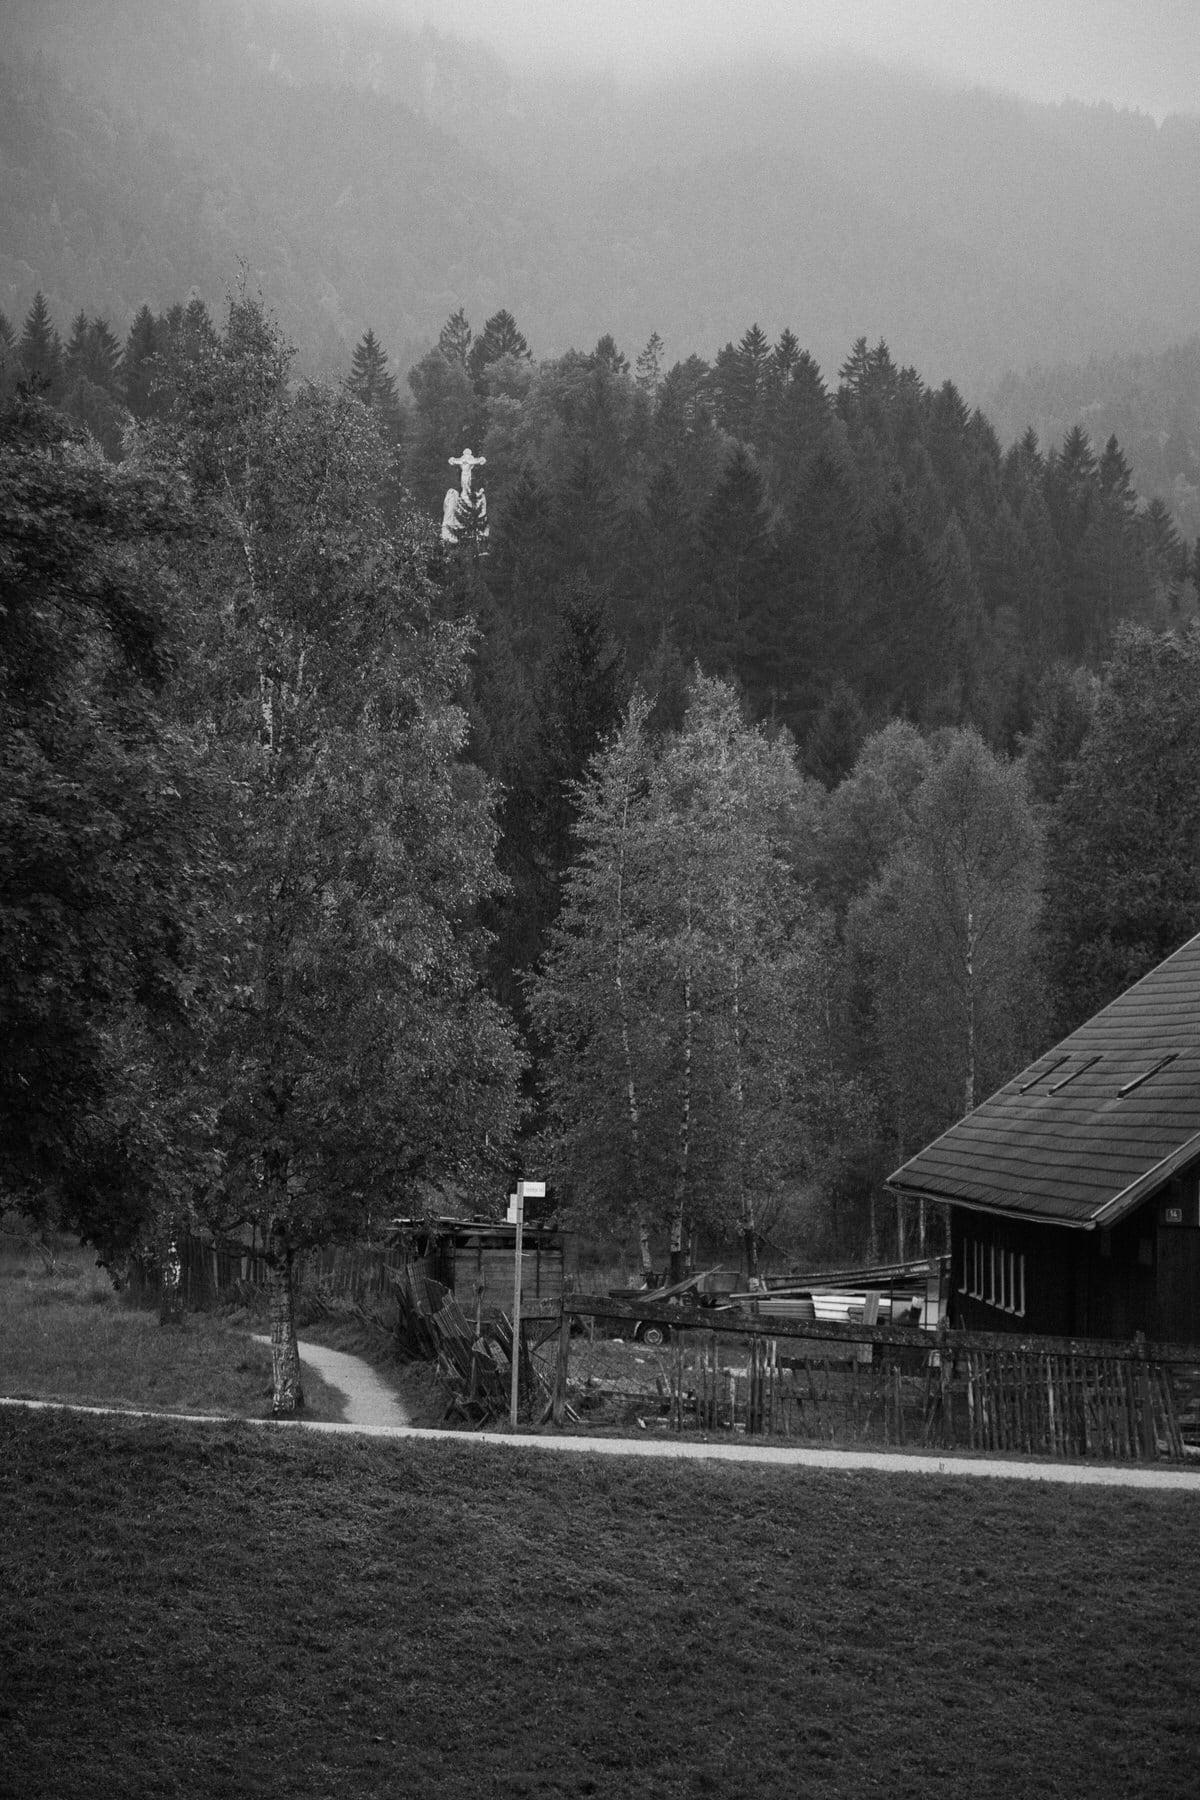 Garmisch_Germany-black-and-white-fine-art-photography-by-Studio-L-photographer-Laura-Schneider-_3651